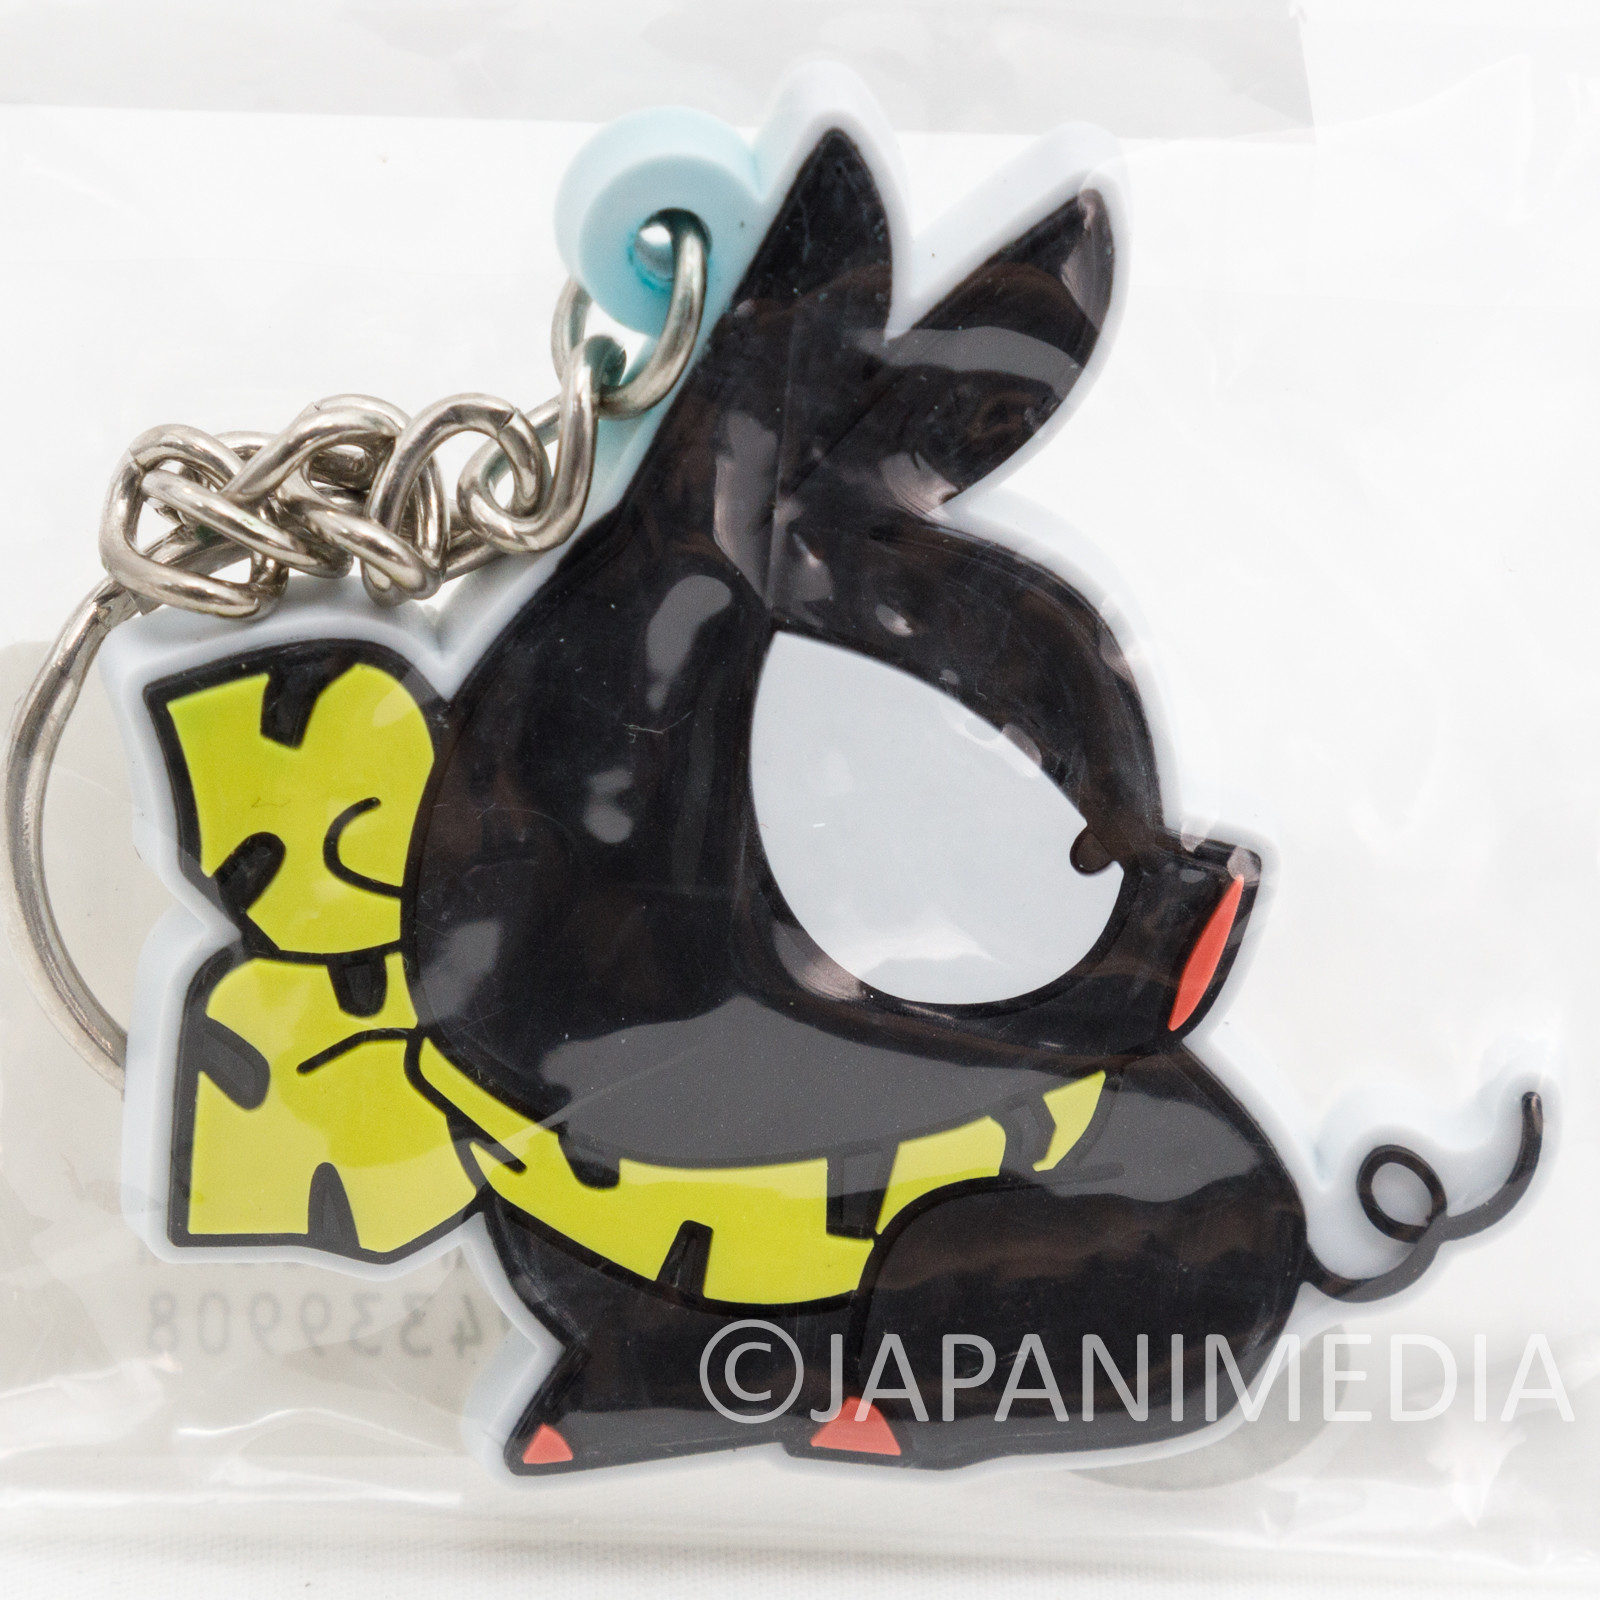 Ranma 1/2 P-Chan Ryoga Rubber Mascot Keychain JAPAN ANIME MANGA RUMIKO TAKAHASHI